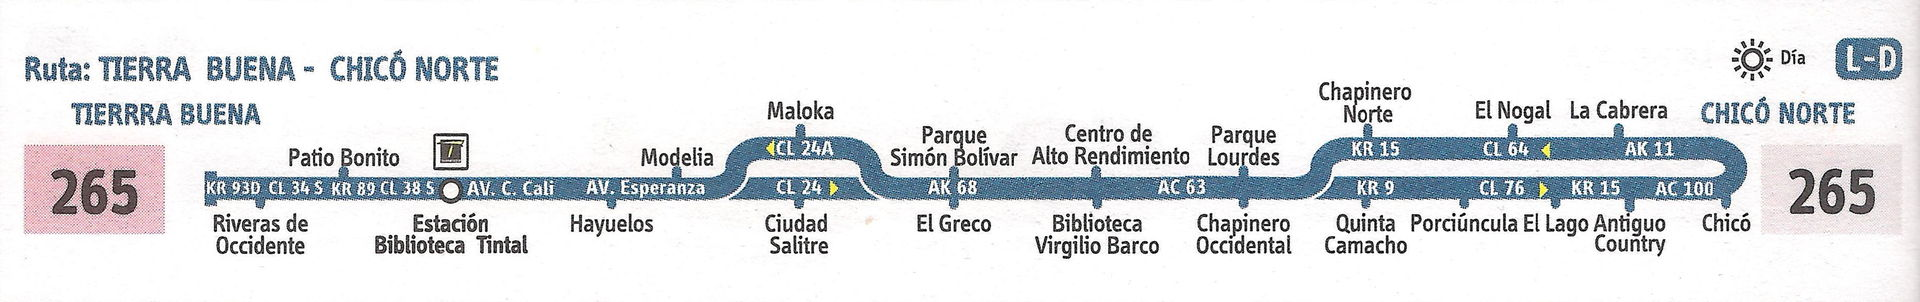 Ruta SITP: 265 Tierra Buena ↔ Chicó Norte [Urbana] 8